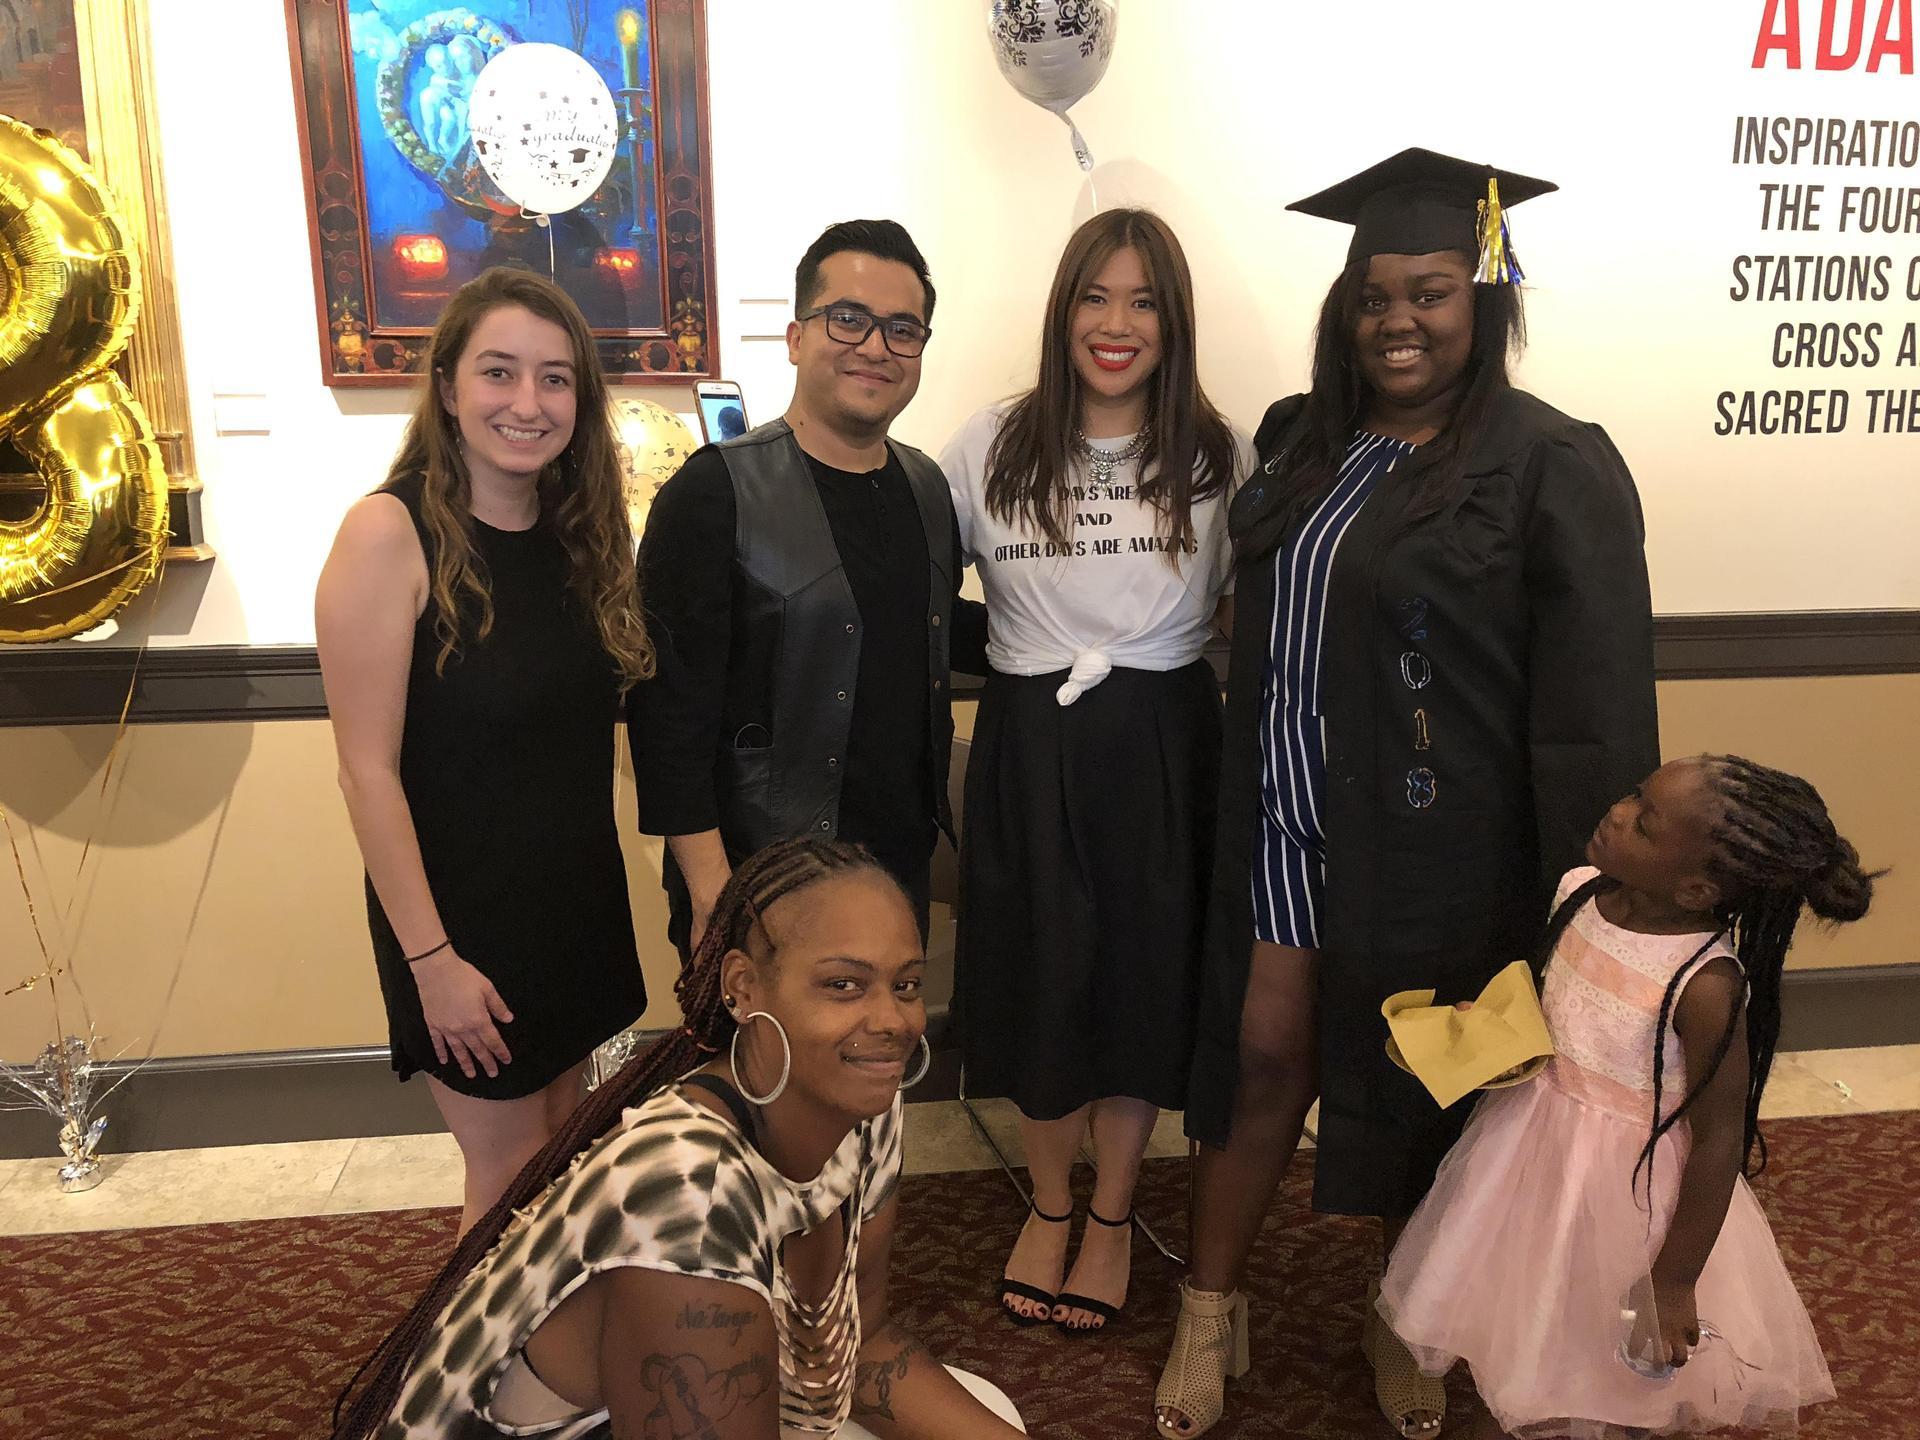 Avalon staff pose with a graduate